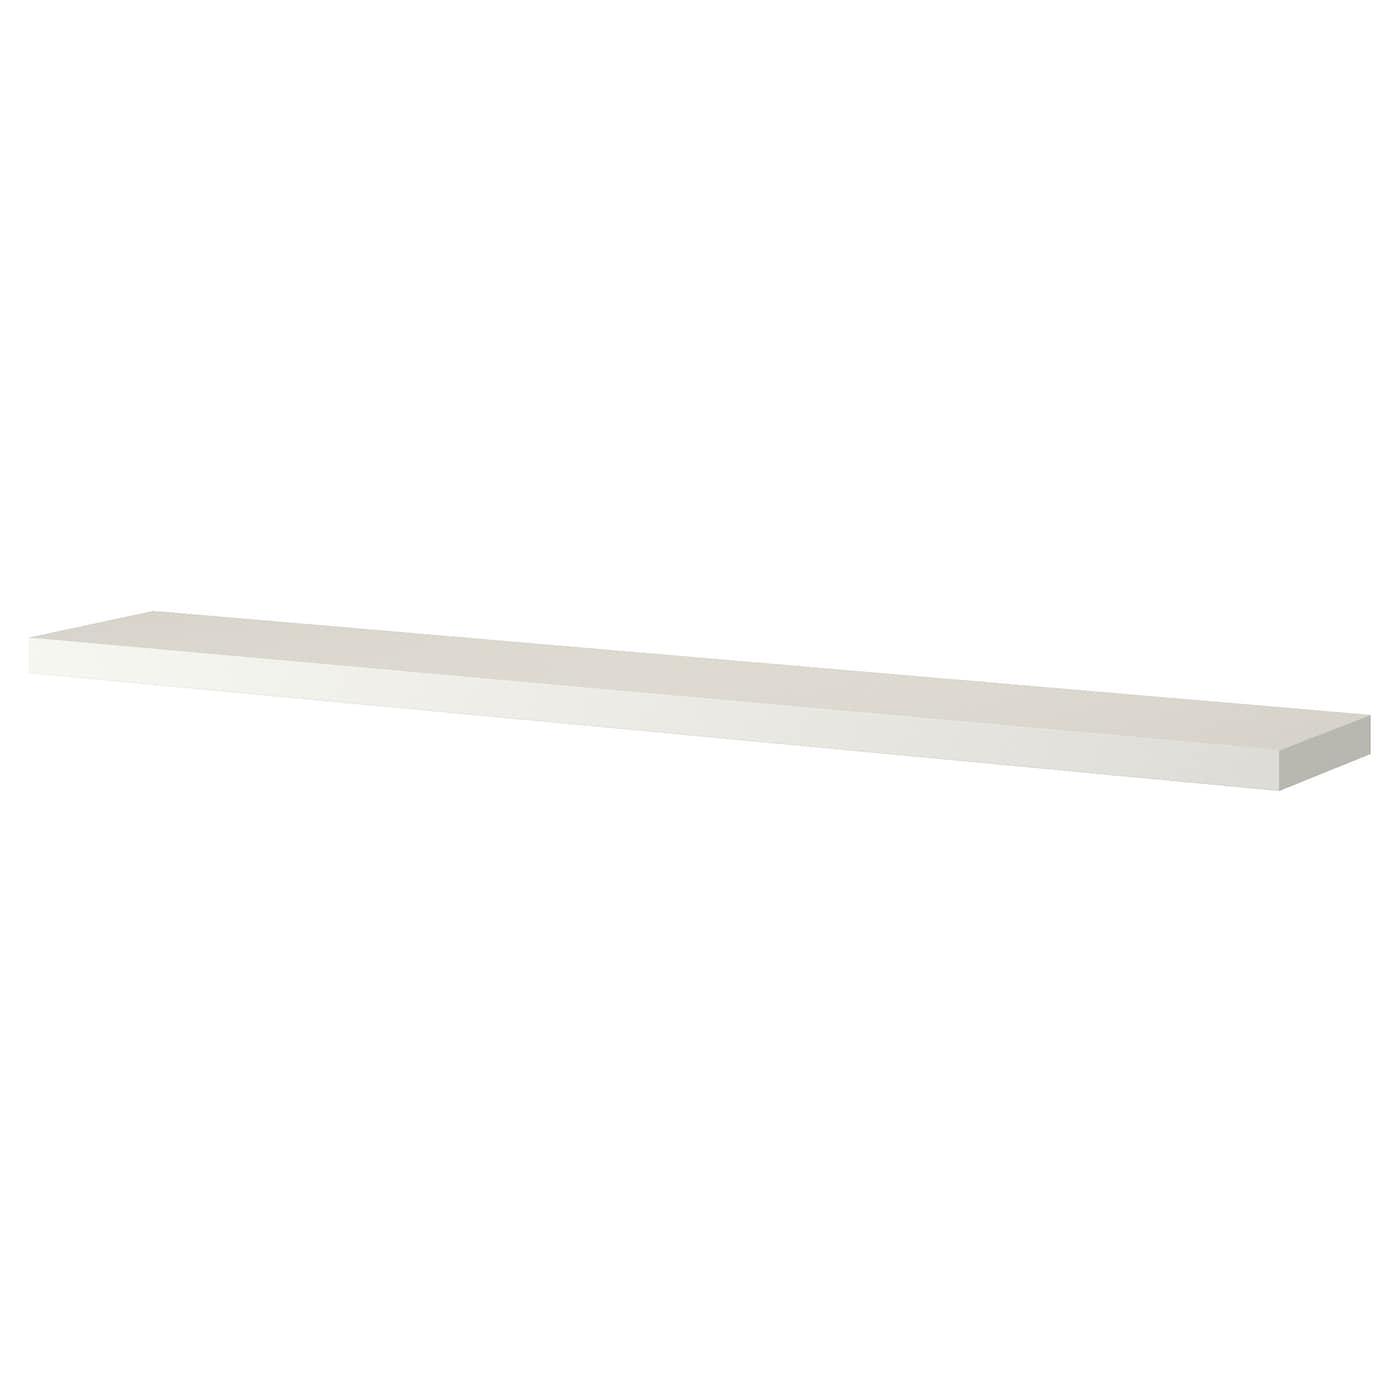 Lack wall shelf white 190x26 cm ikea for Ikea shelf white